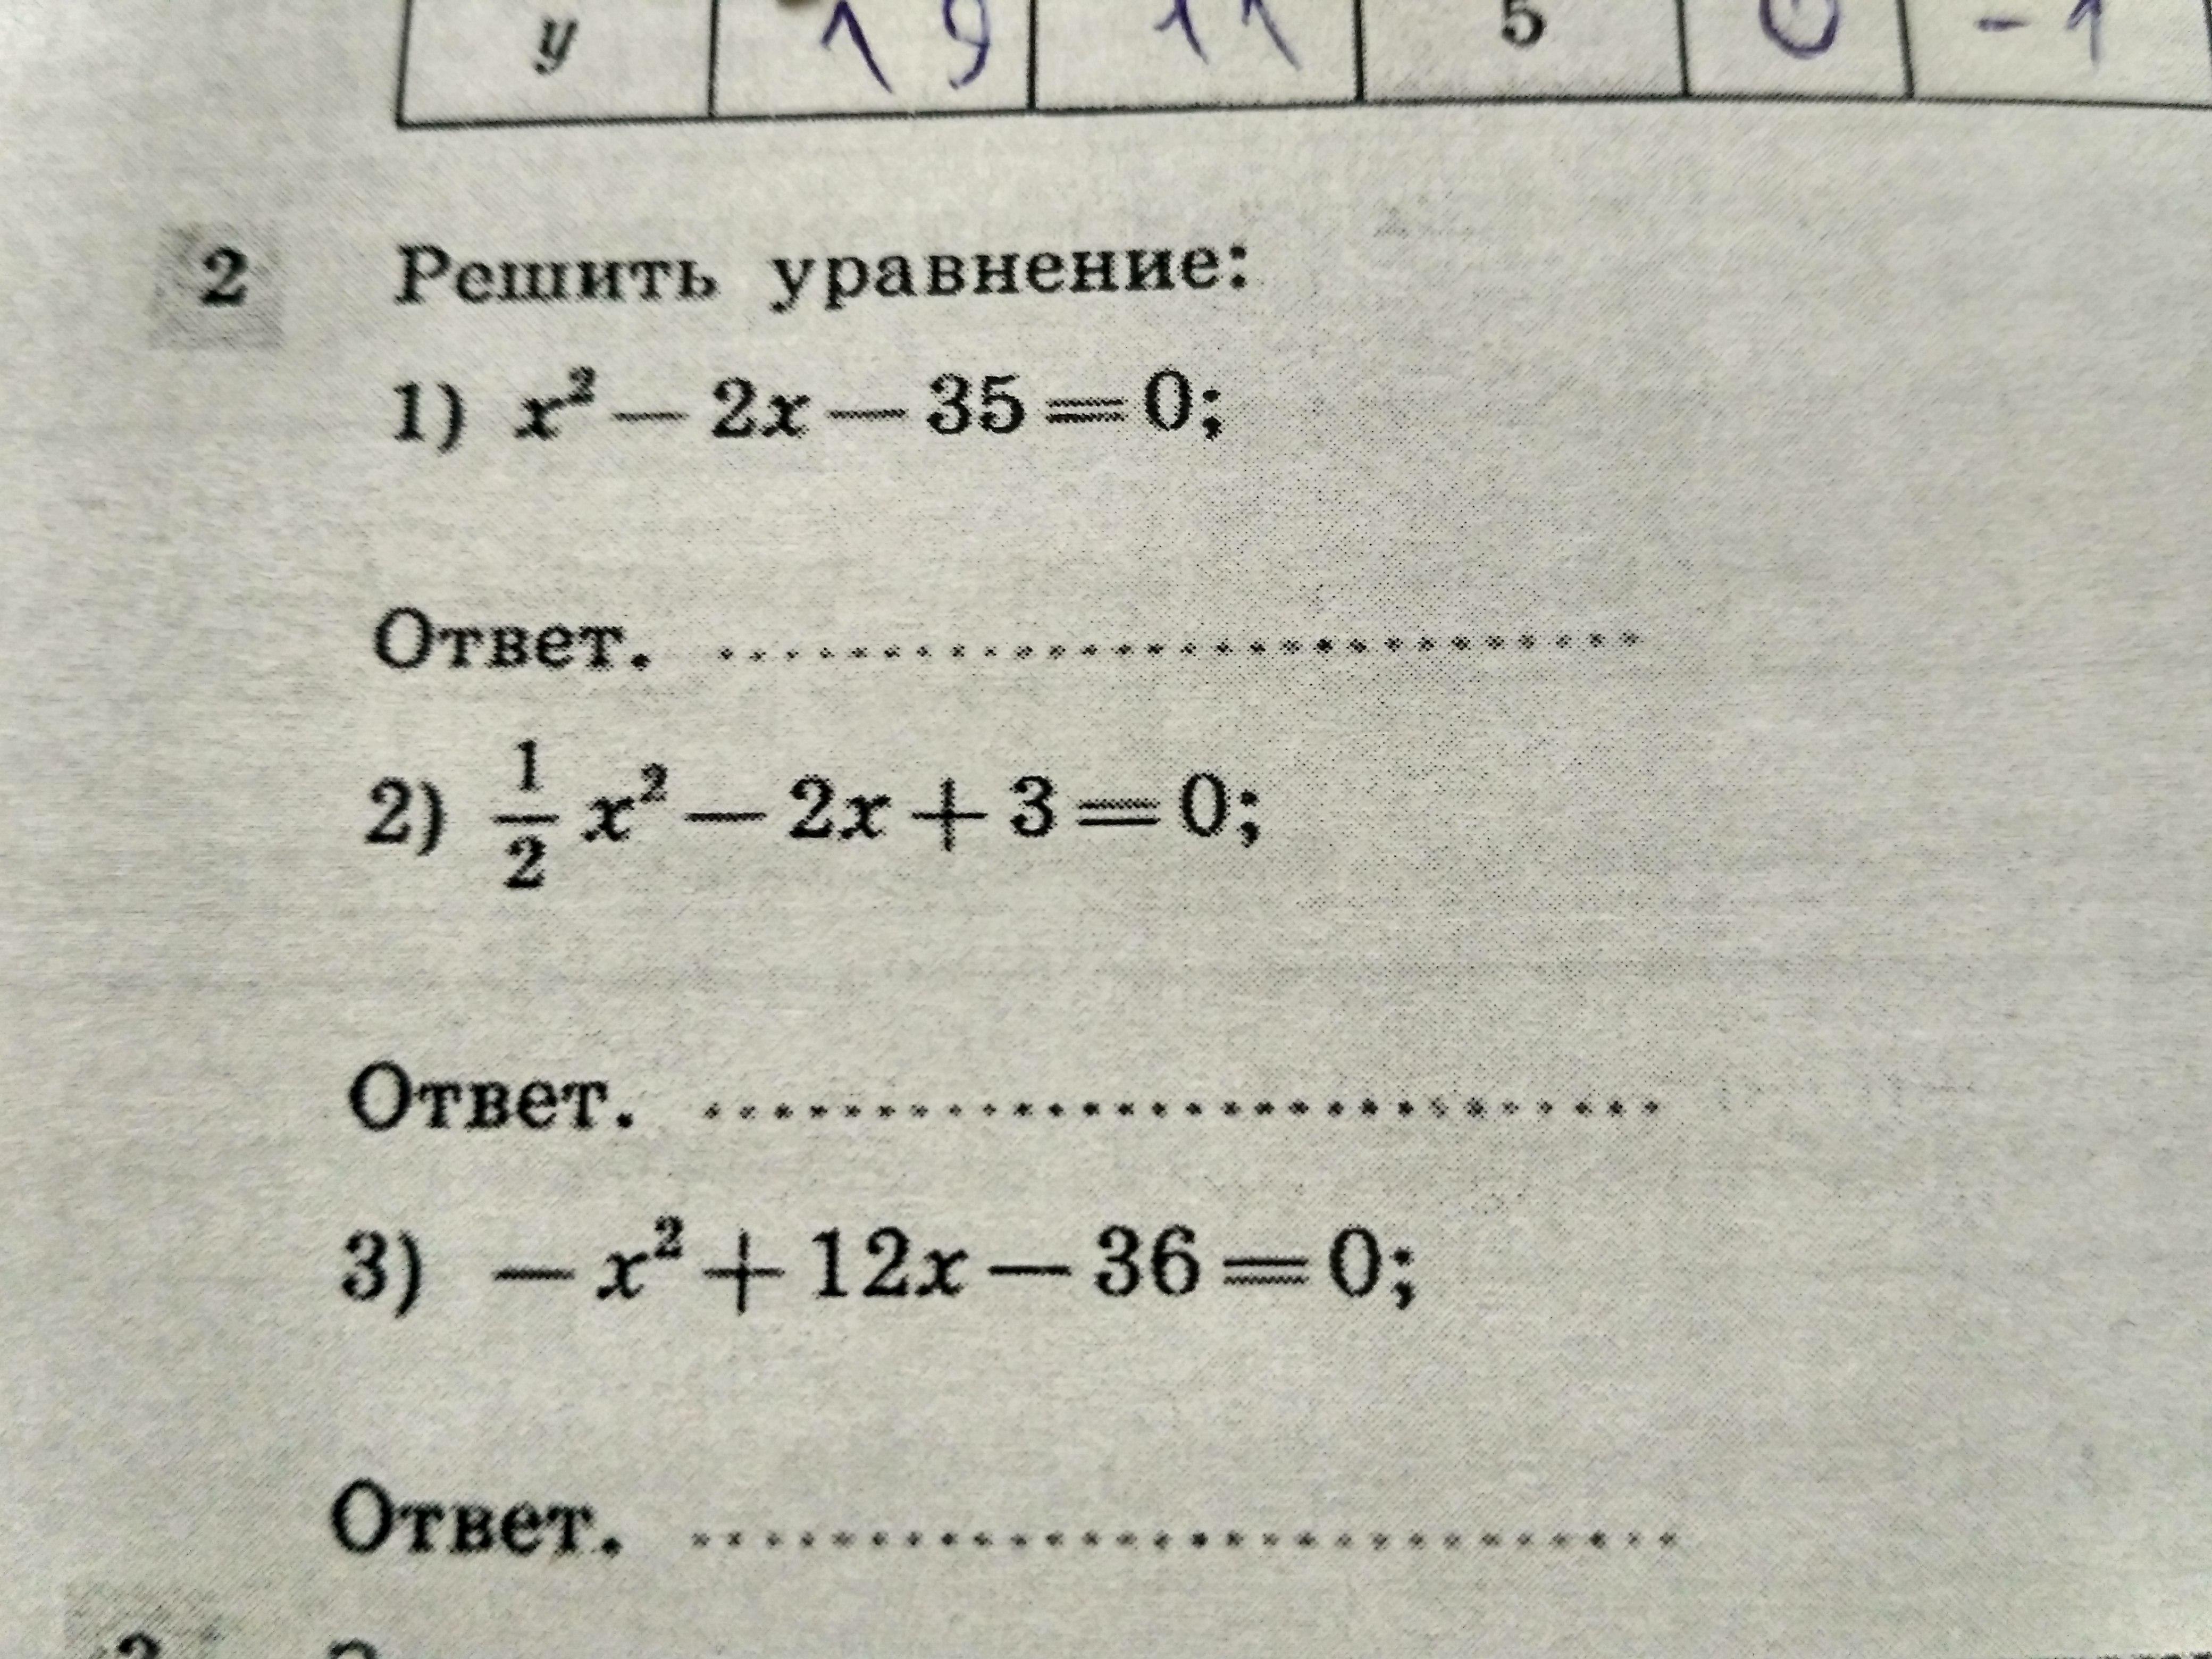 Решите уравнения срочно нужно?